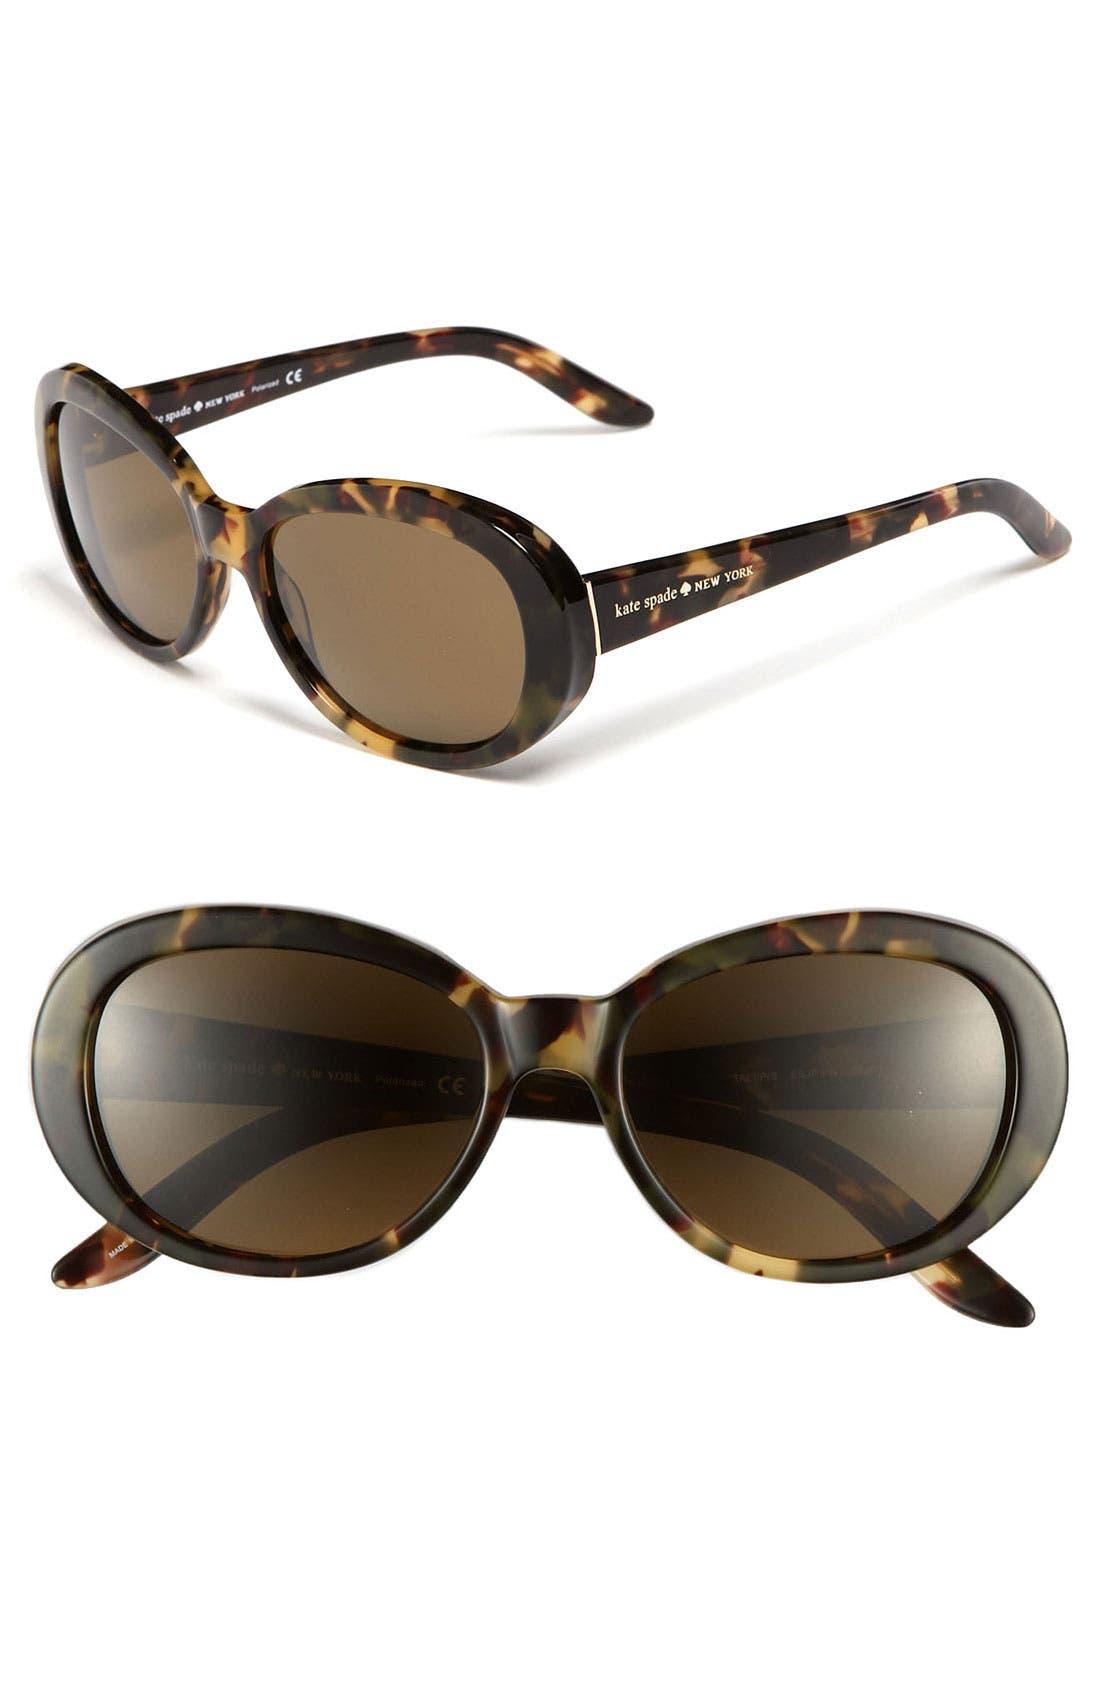 Alternate Image 1 Selected - kate spade new york 'tali' 53mm polarized sunglasses